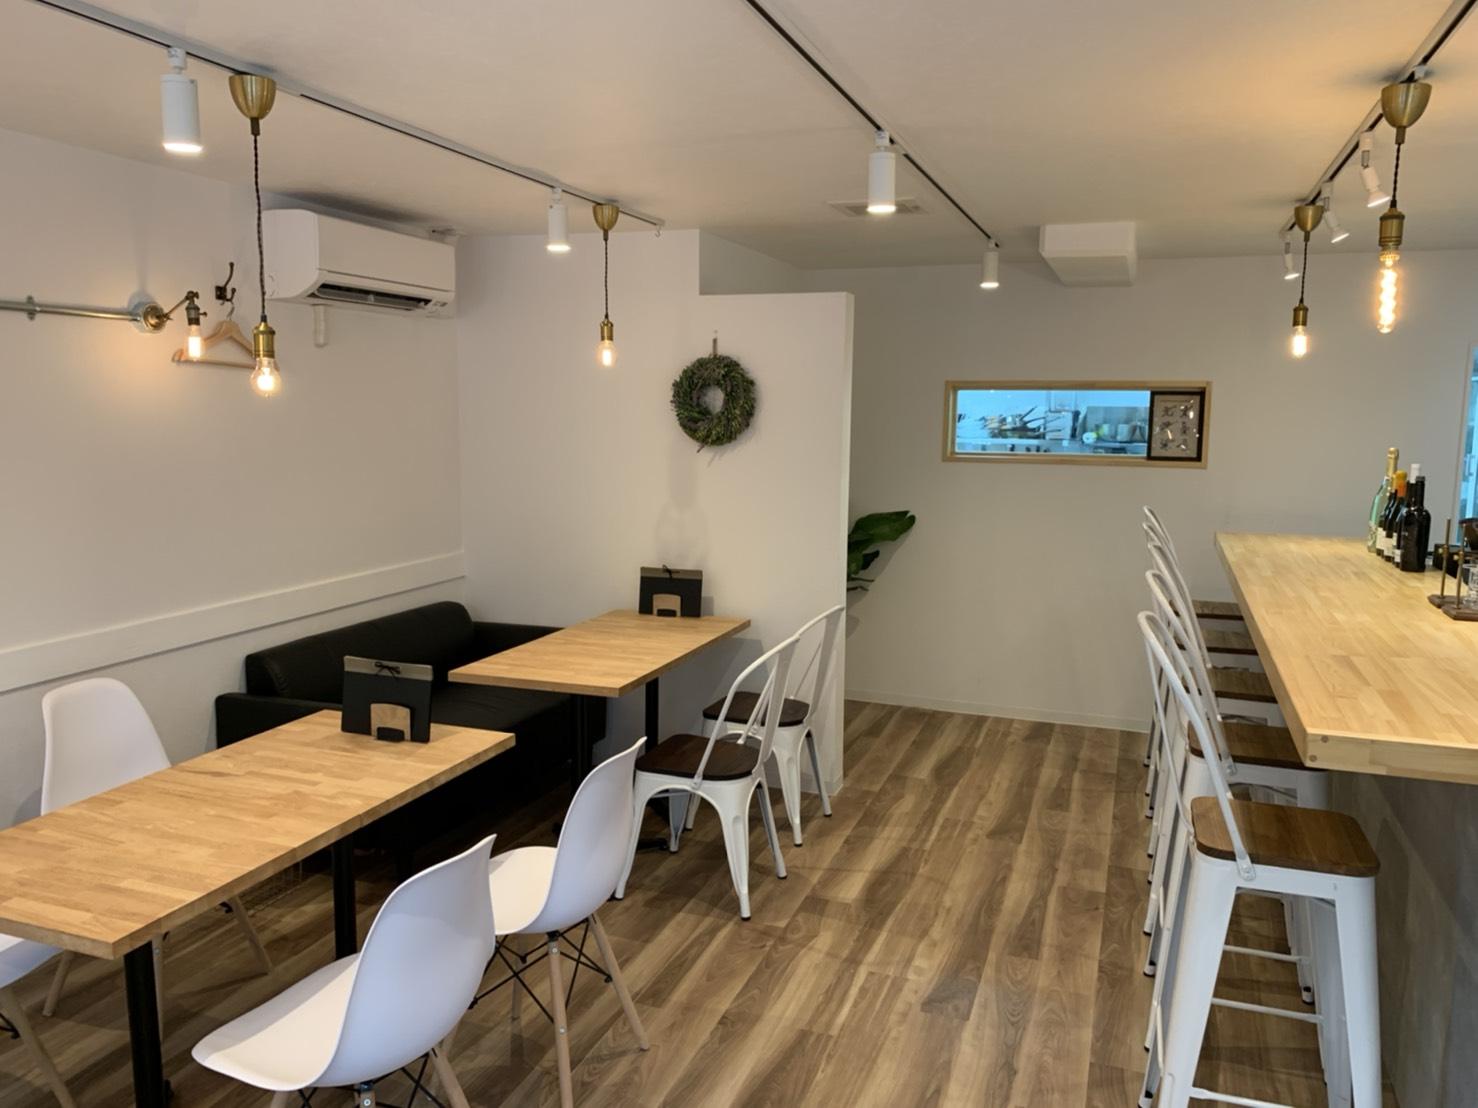 Googleストリートビュー屋内版撮影 サンクフルデイズカフェ